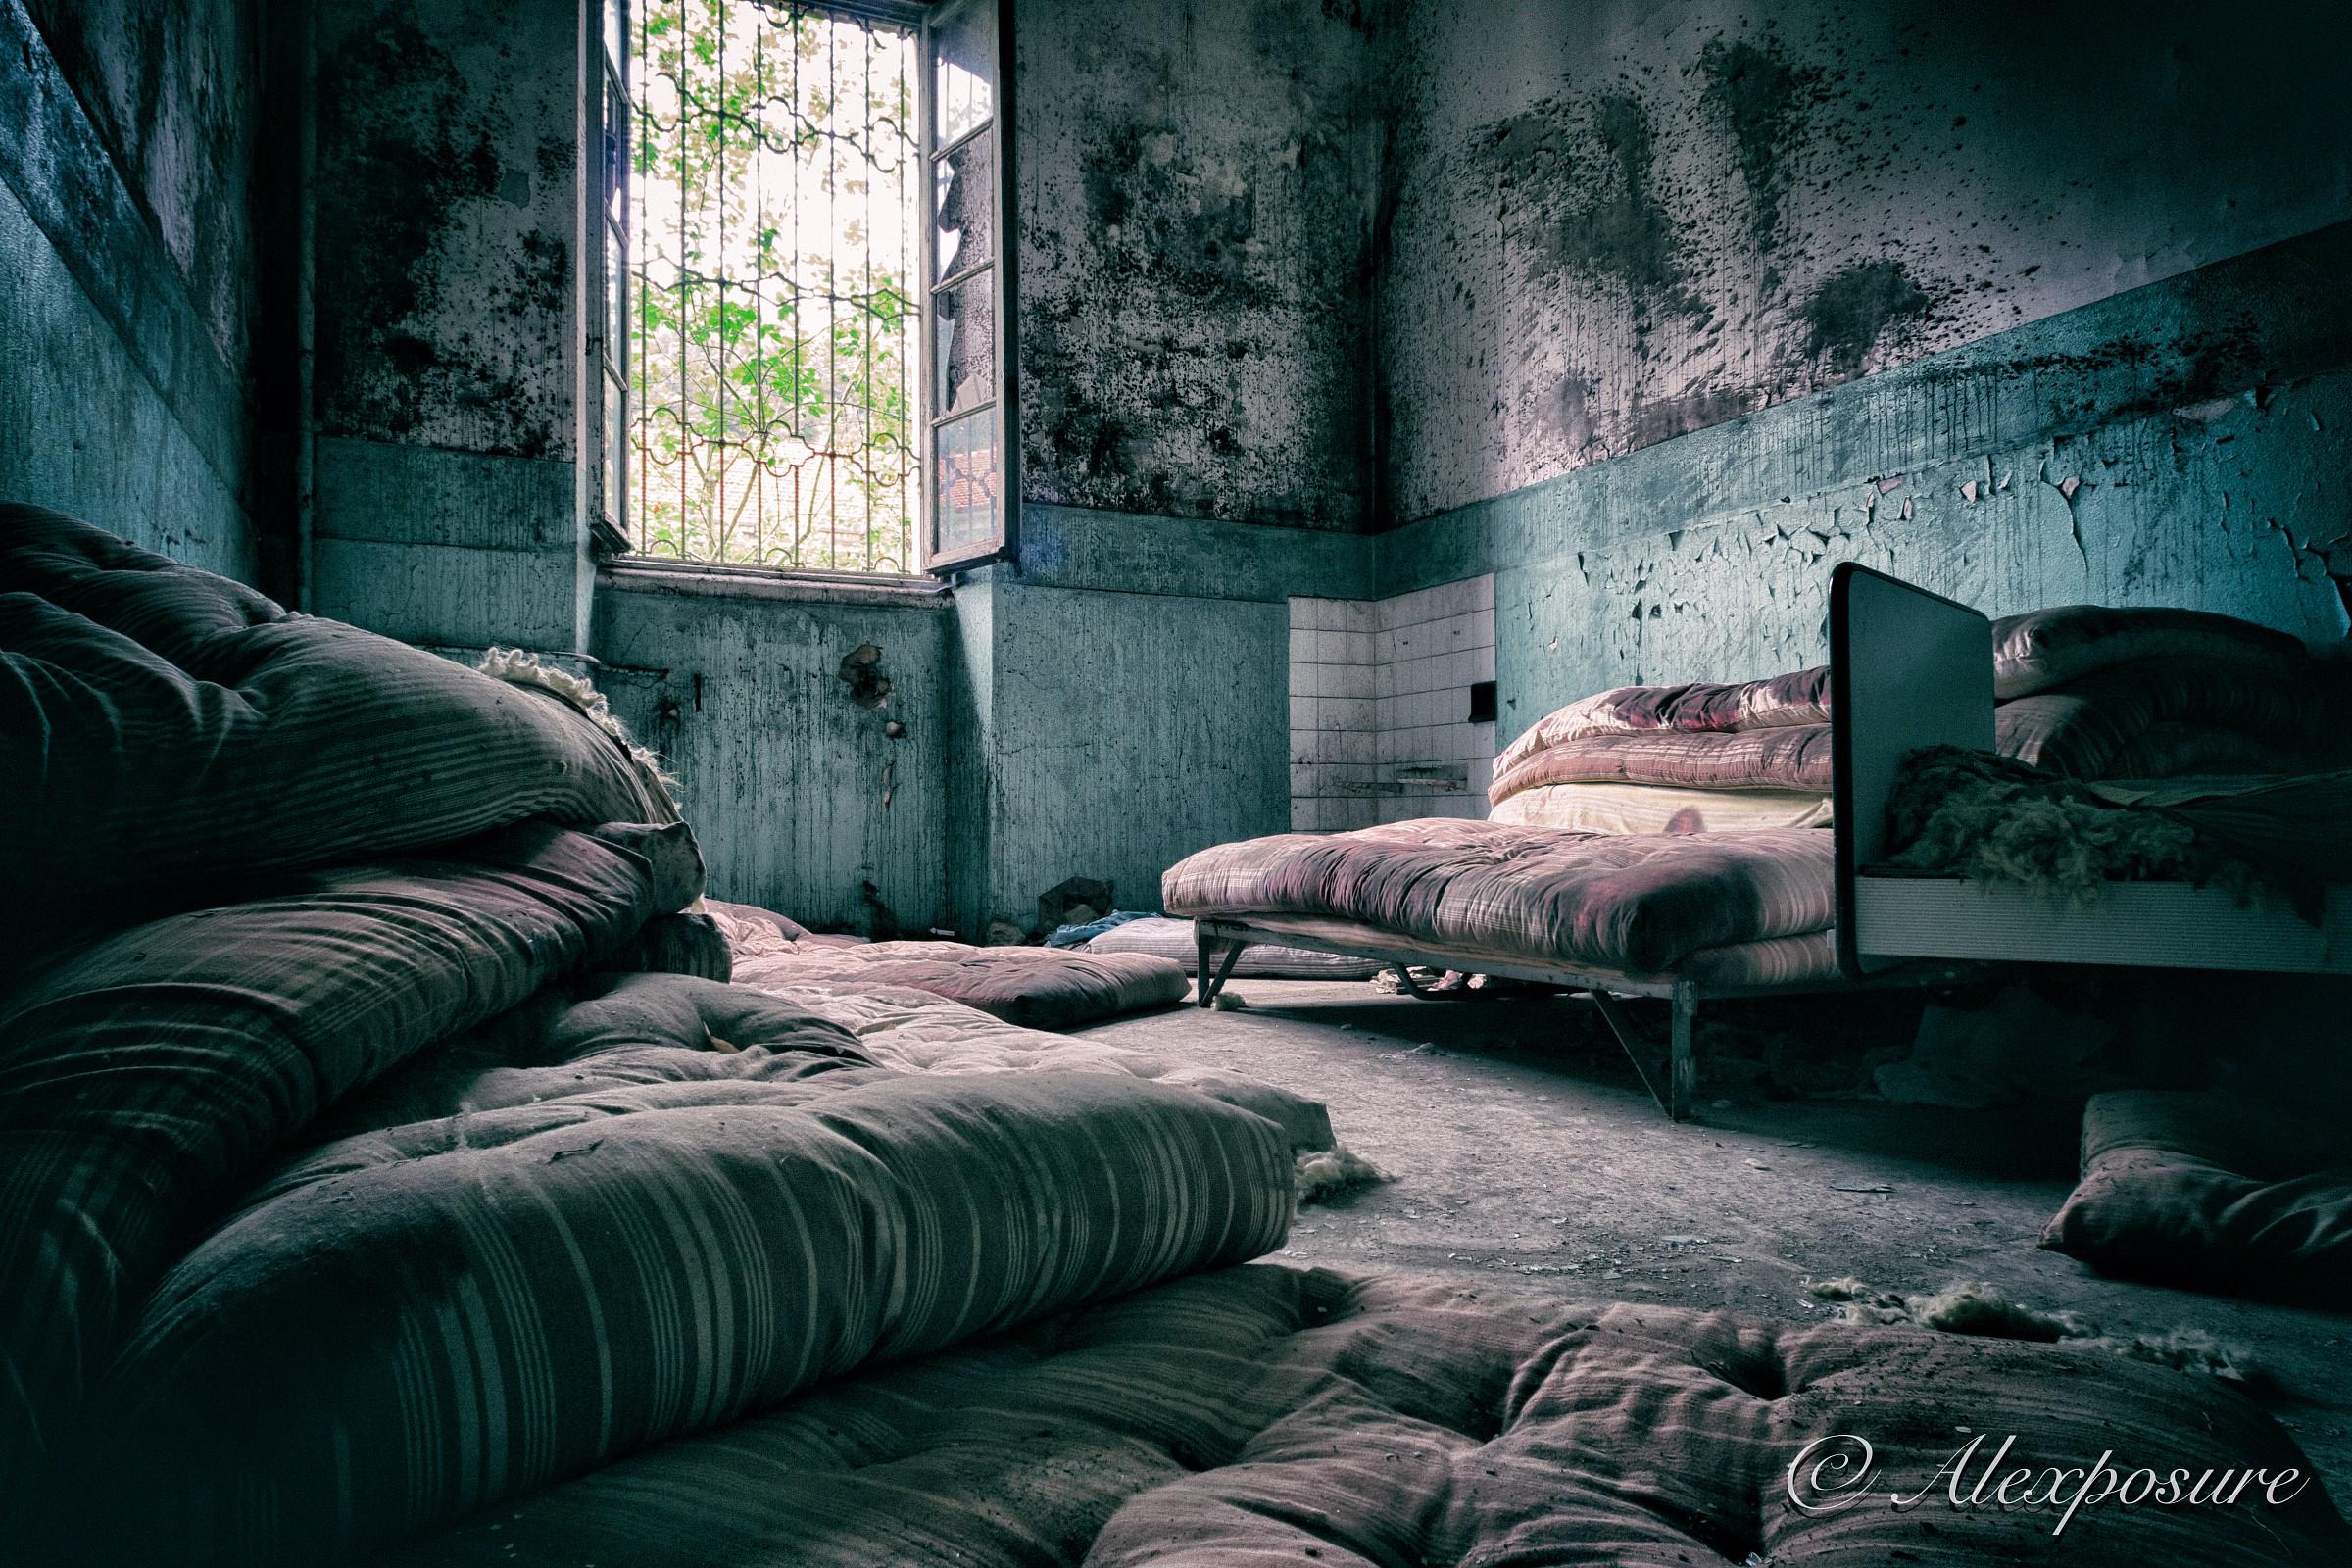 The room mattresses...